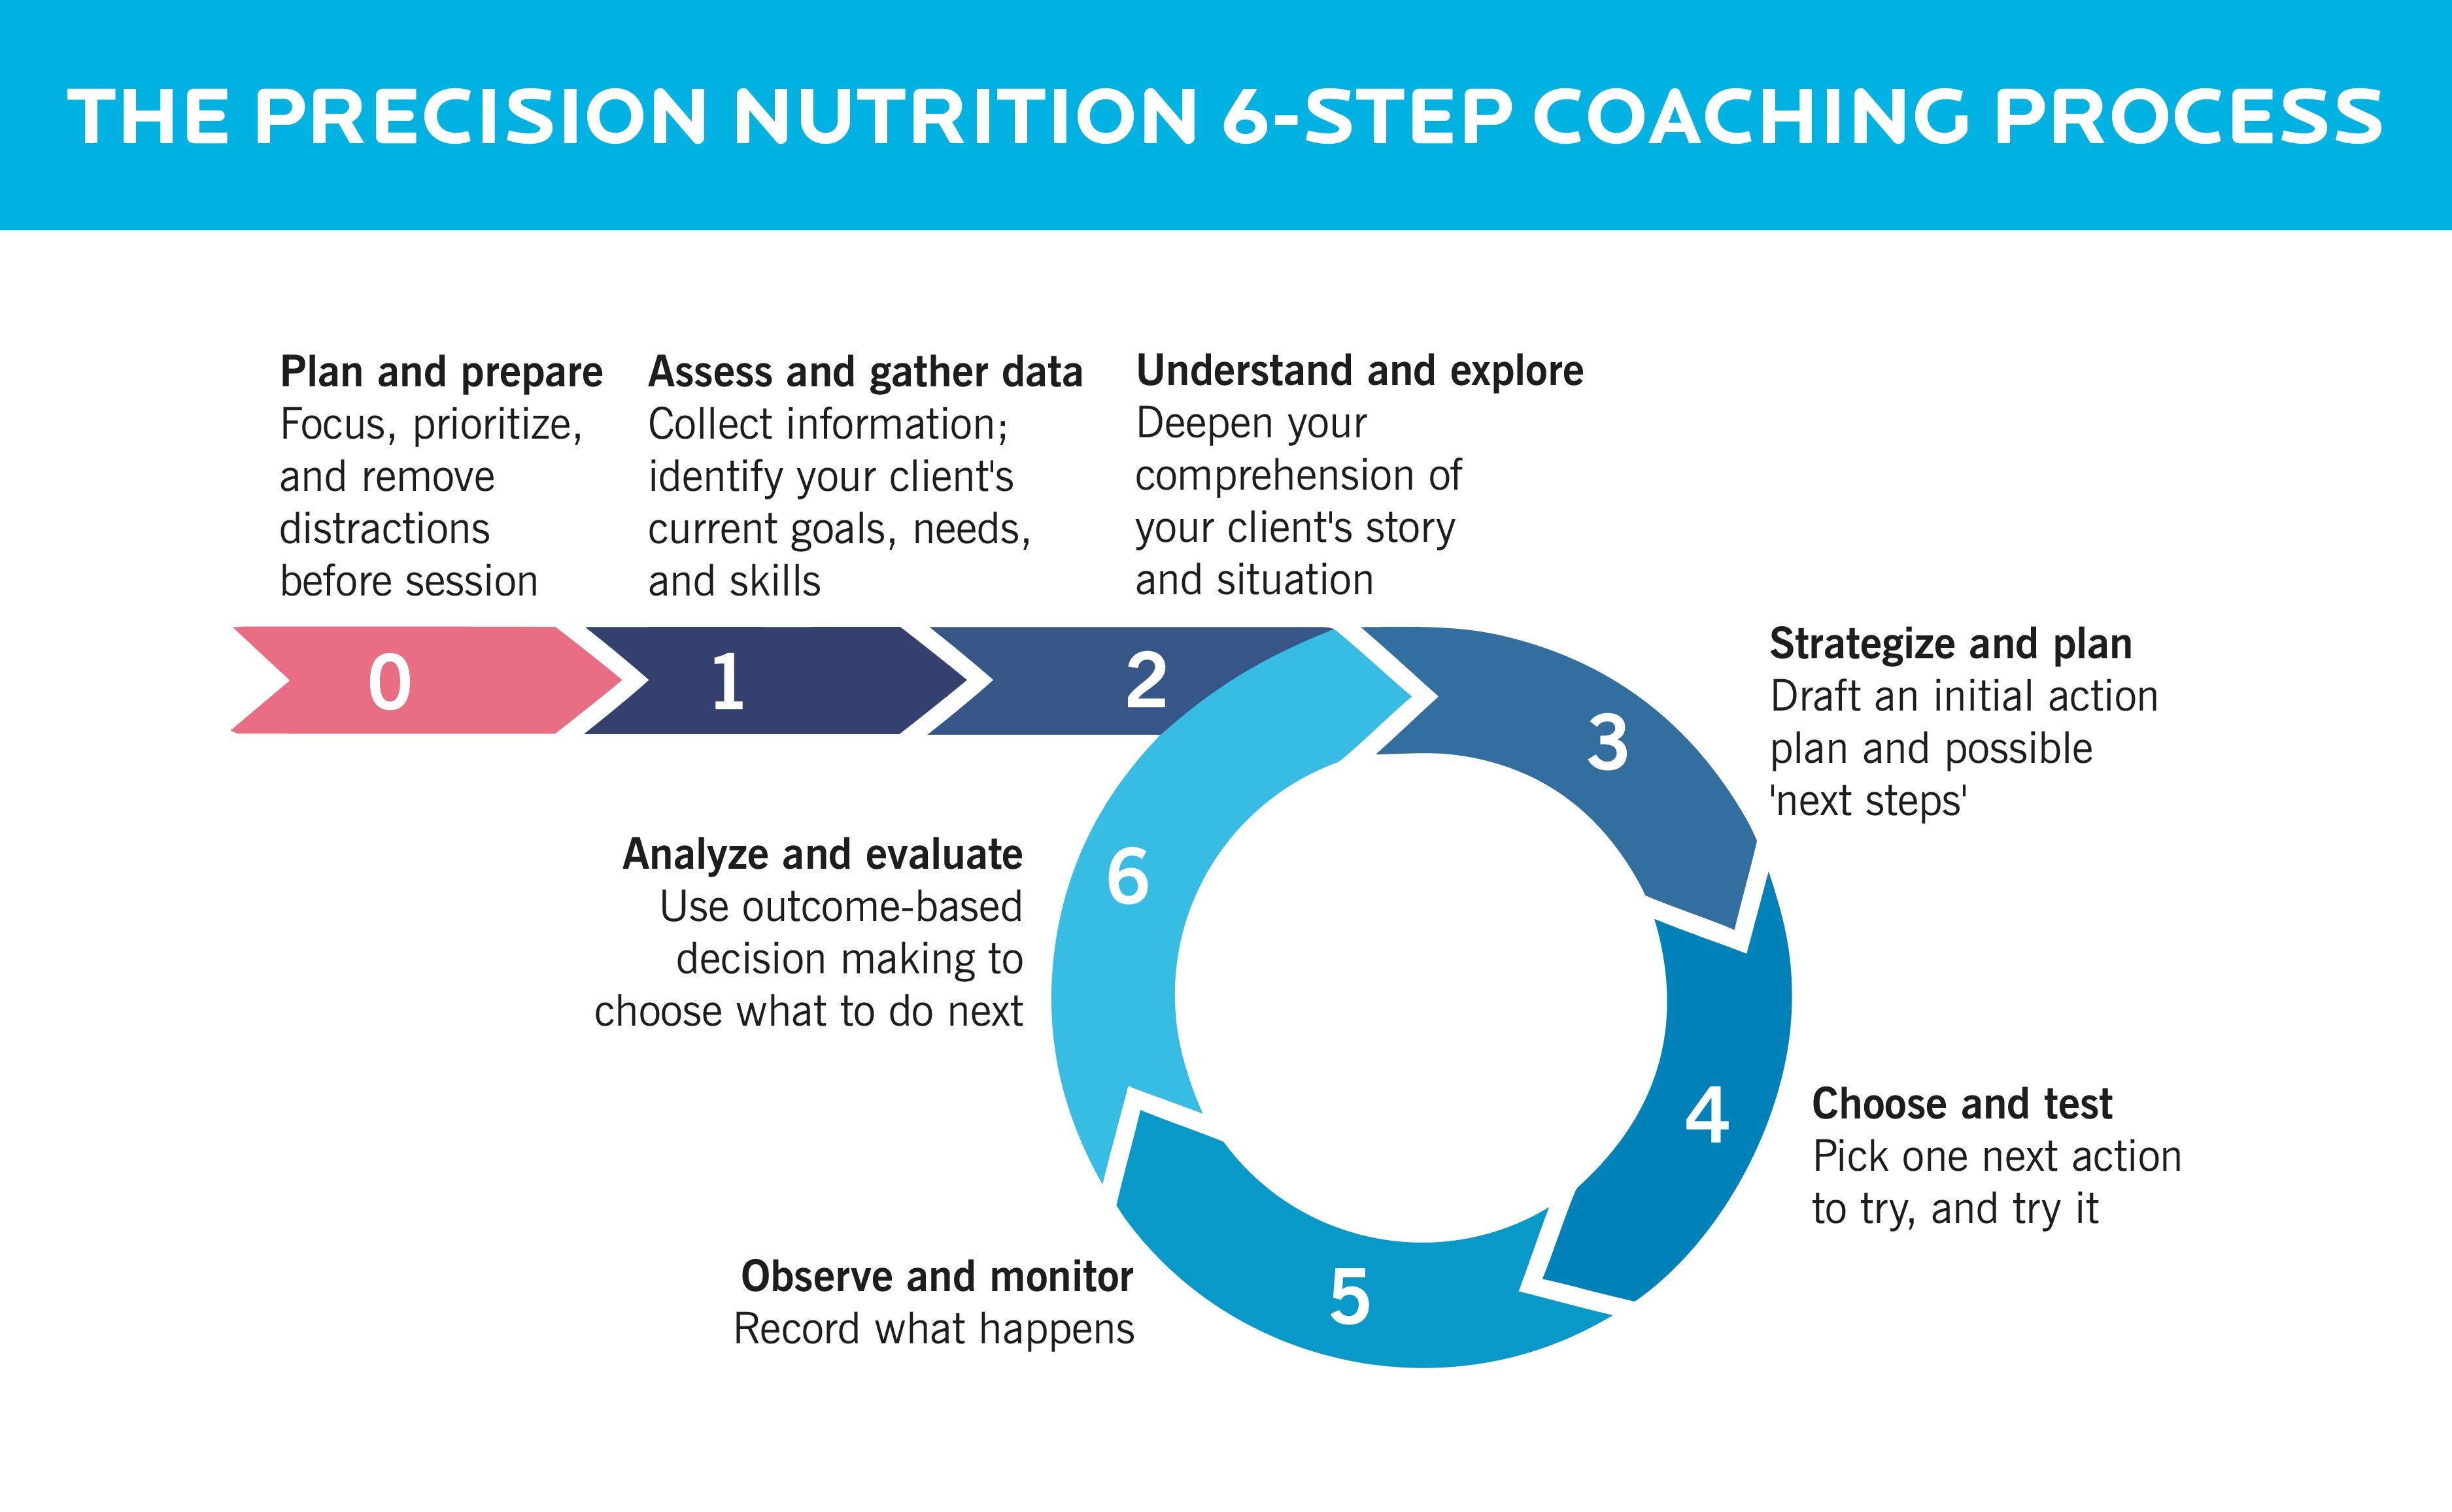 A visual representation of the six steps of Precision Nutrition's coaching framework.